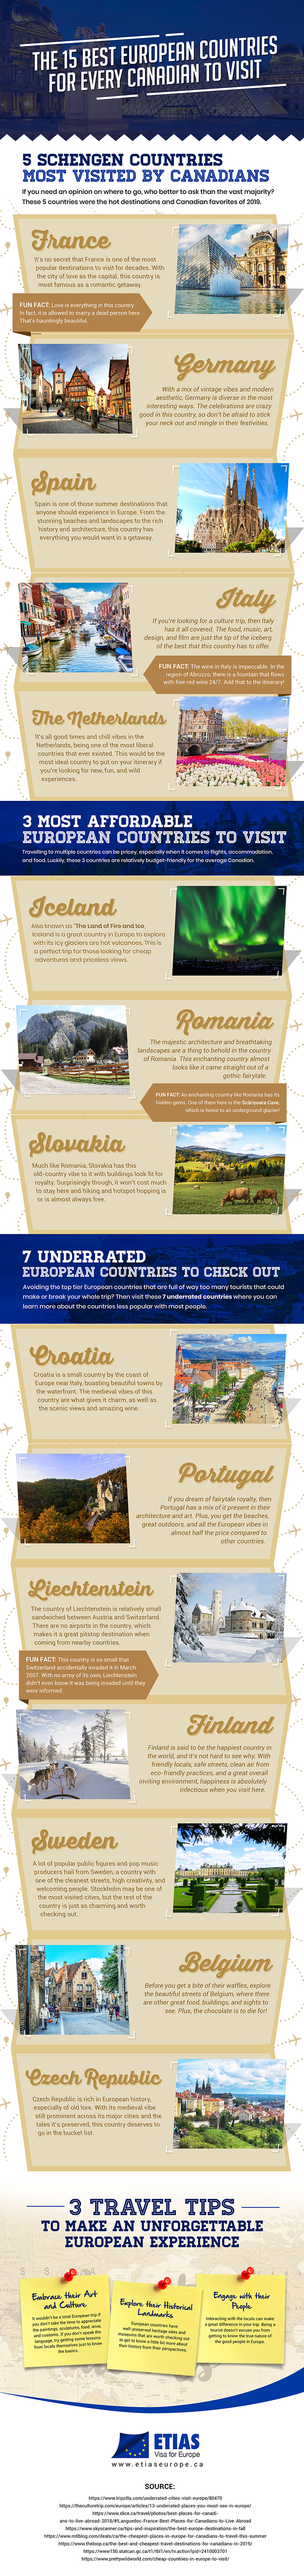 Best European Countries